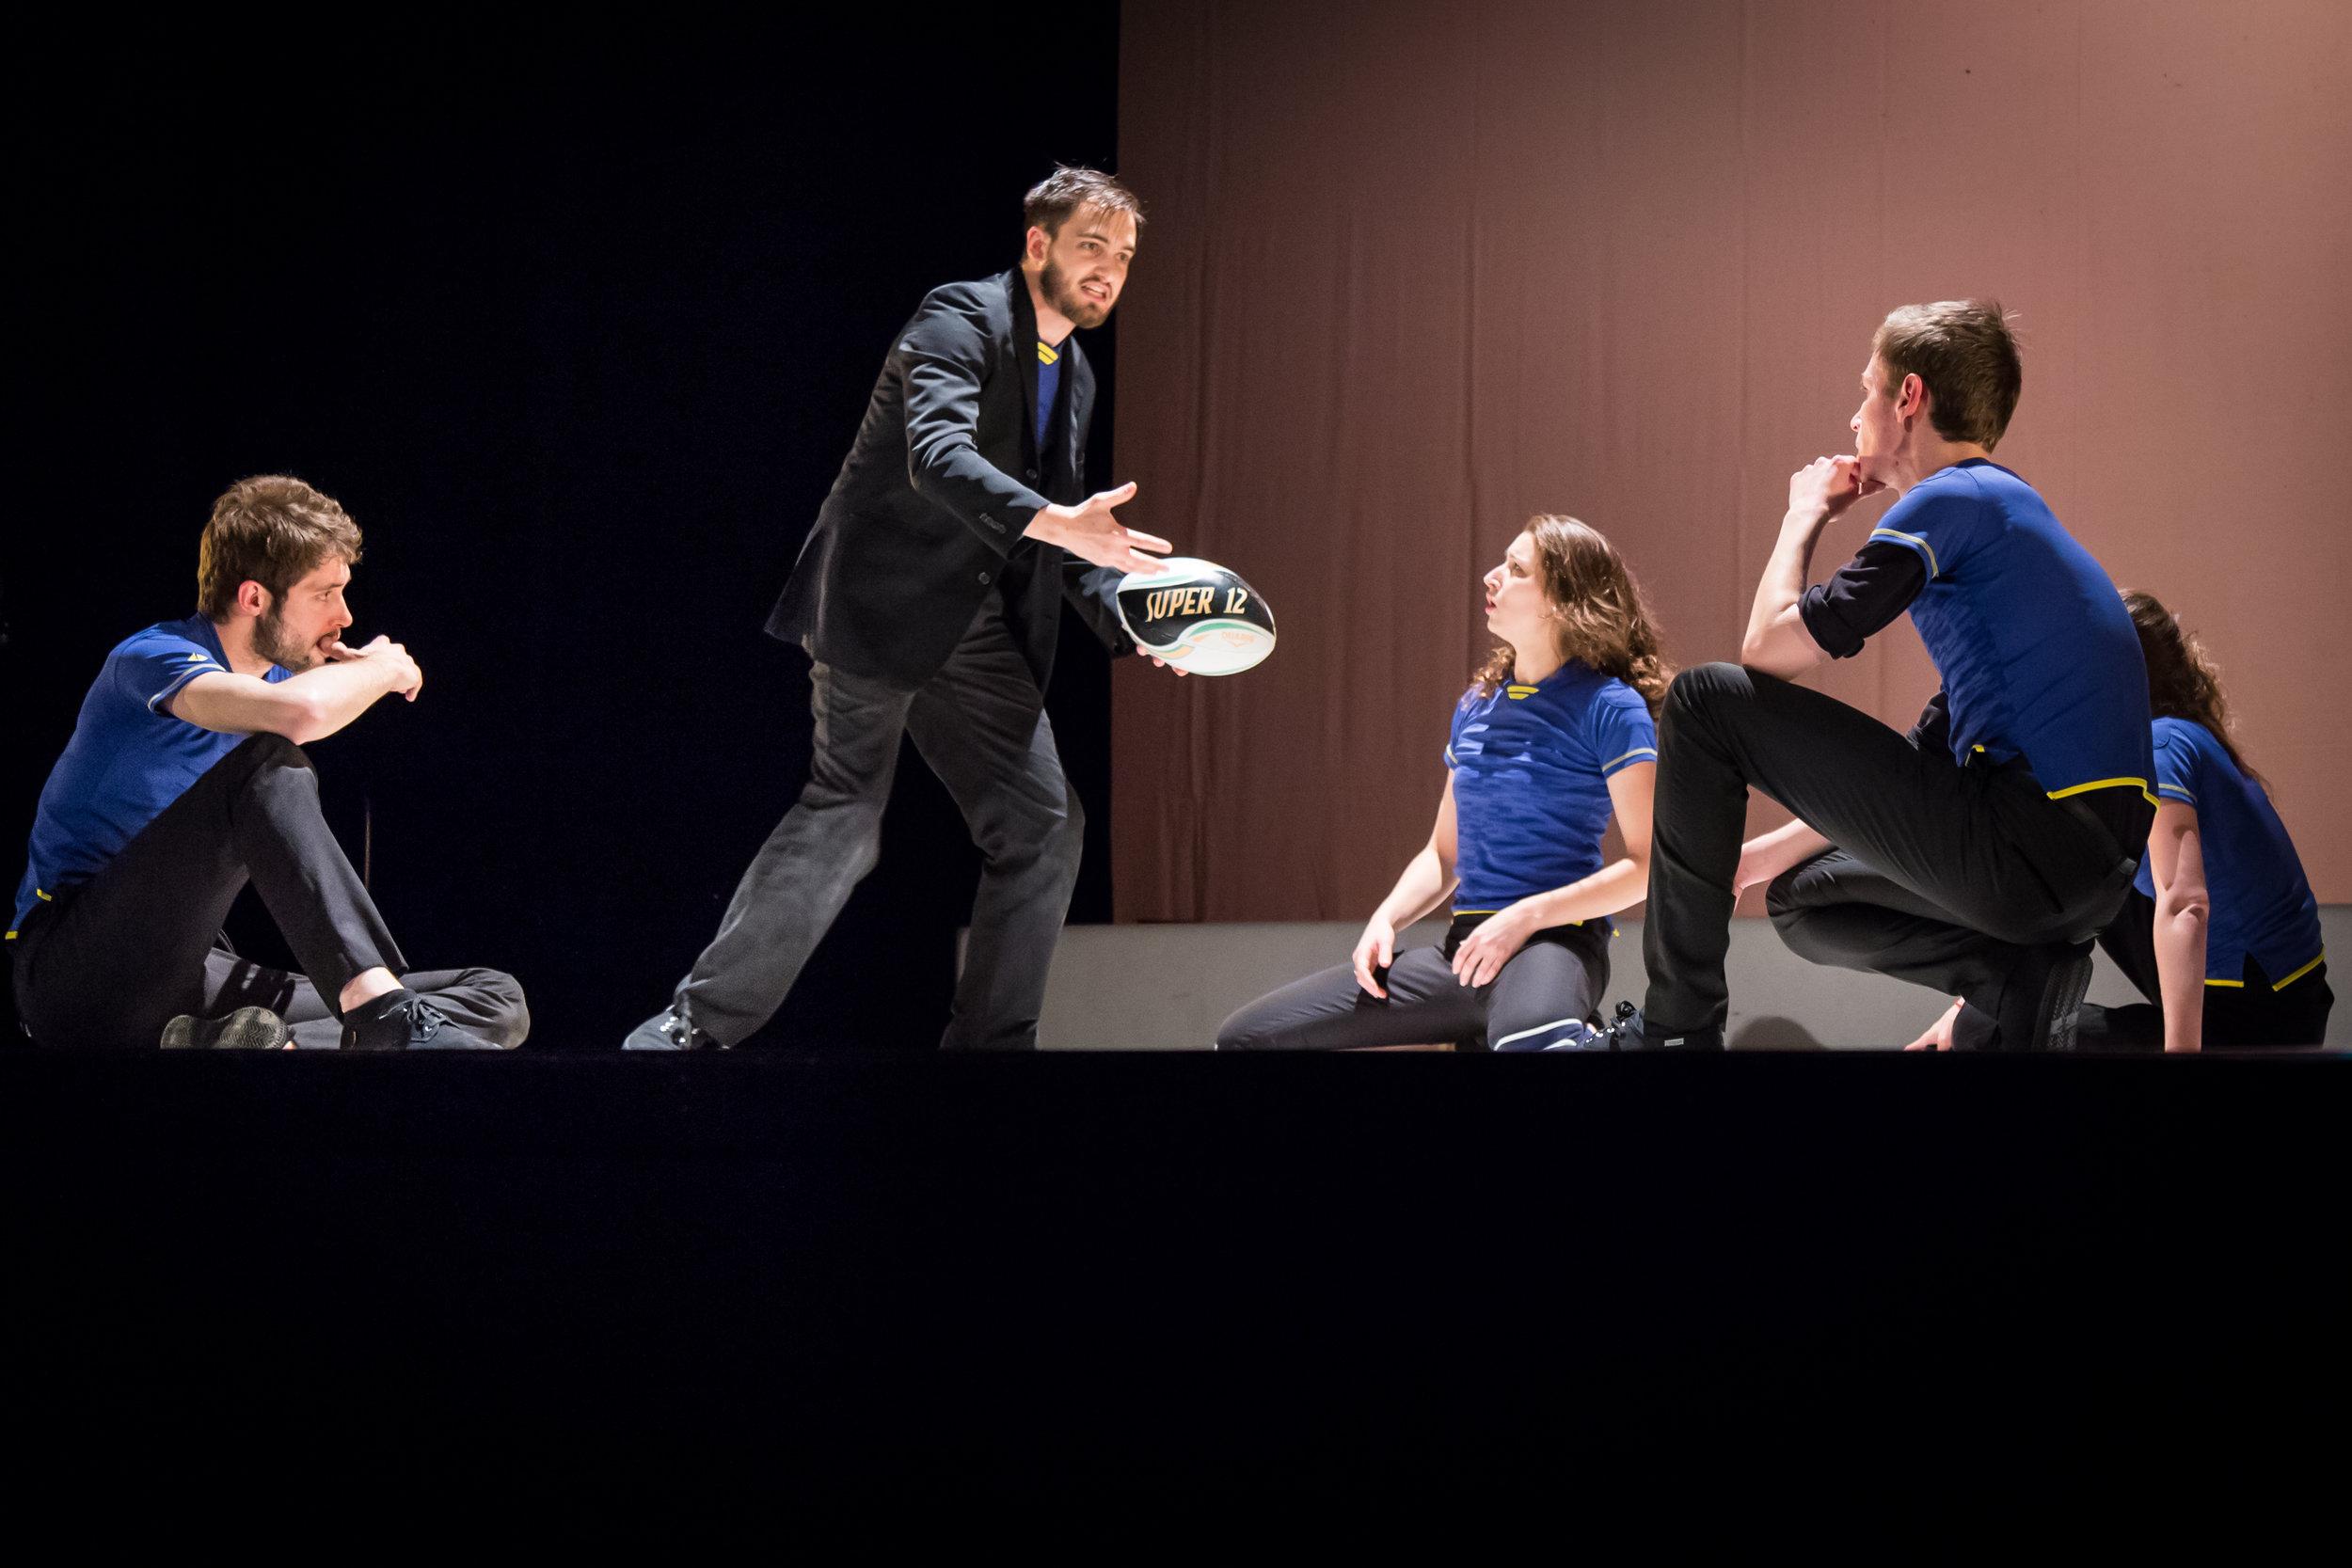 2016-06-10_theatre_de_l-union_124.jpg